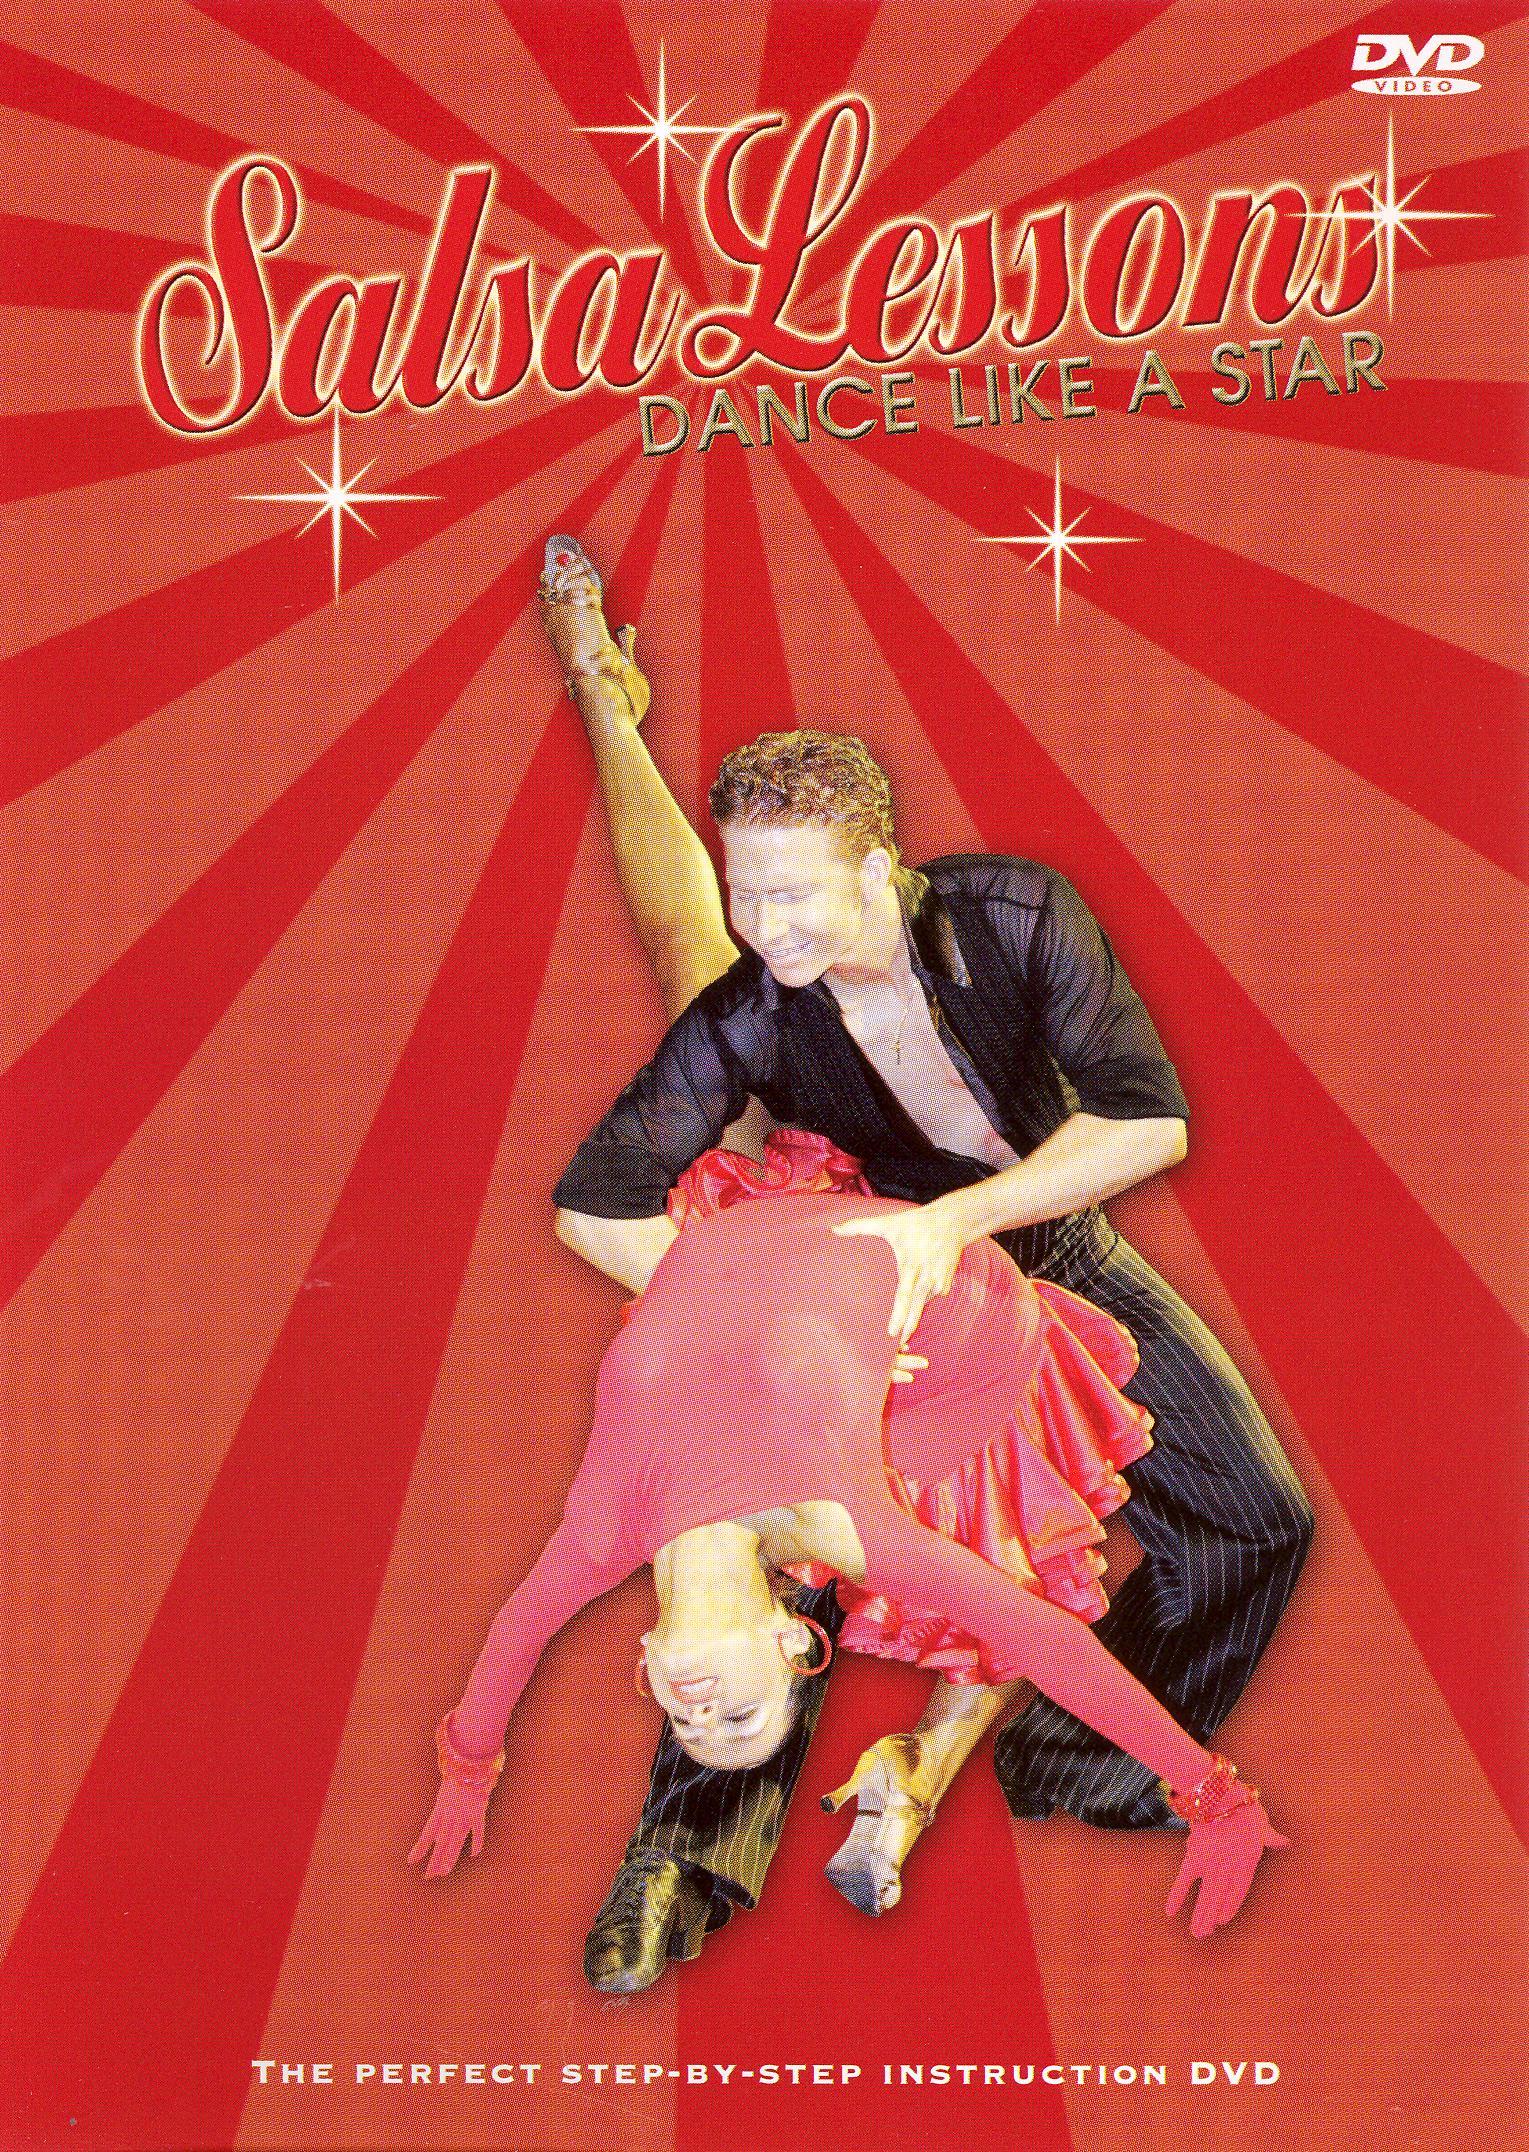 Dance Like a Star: Salsa Lessons